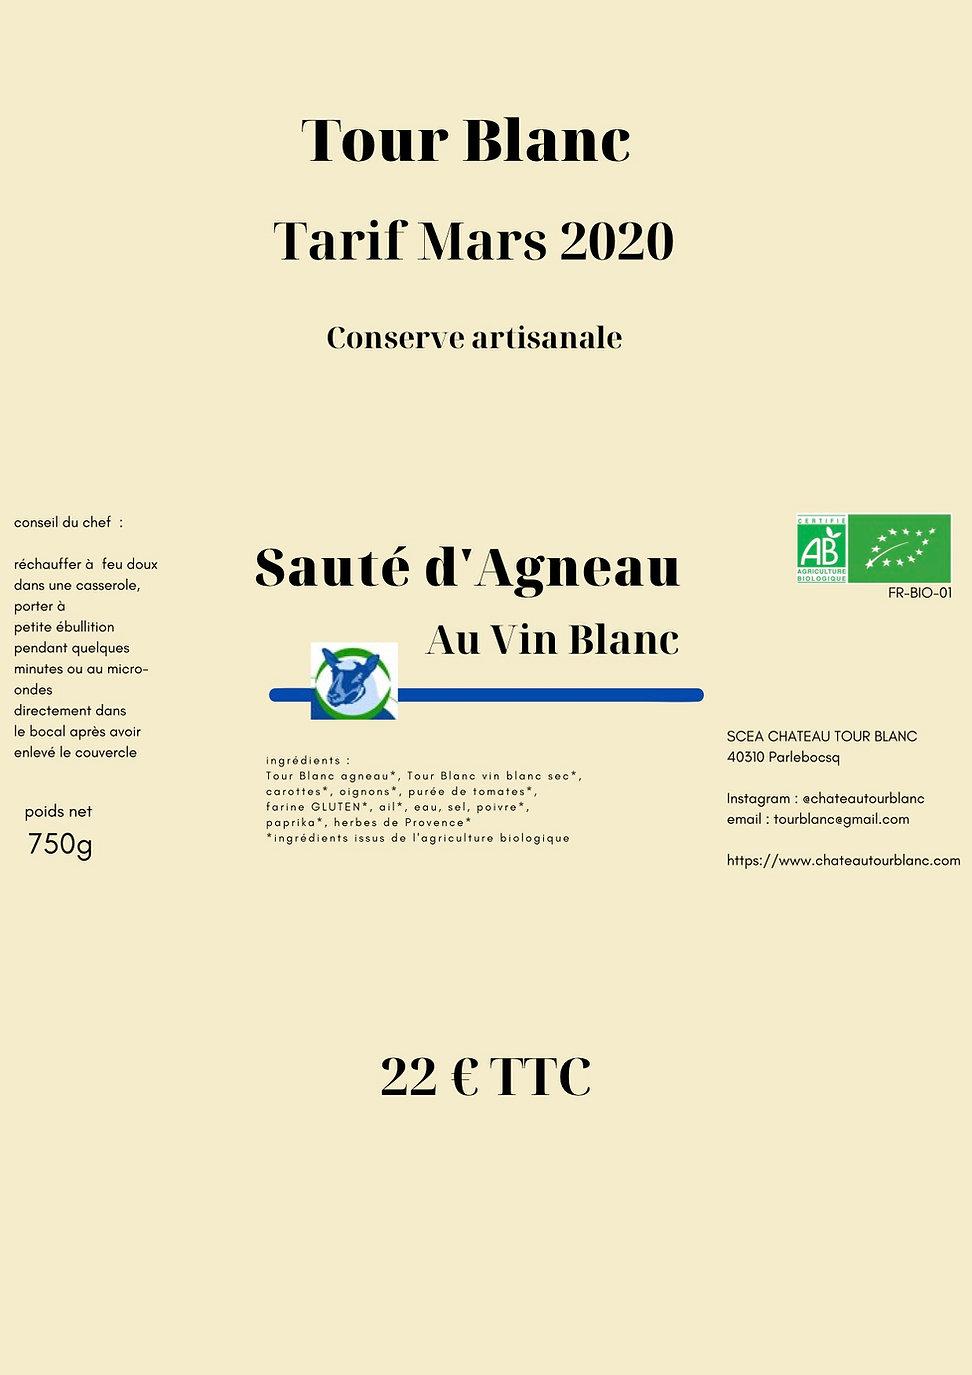 Copie_de_Tarif_Sauté_d'Agneau.jpg